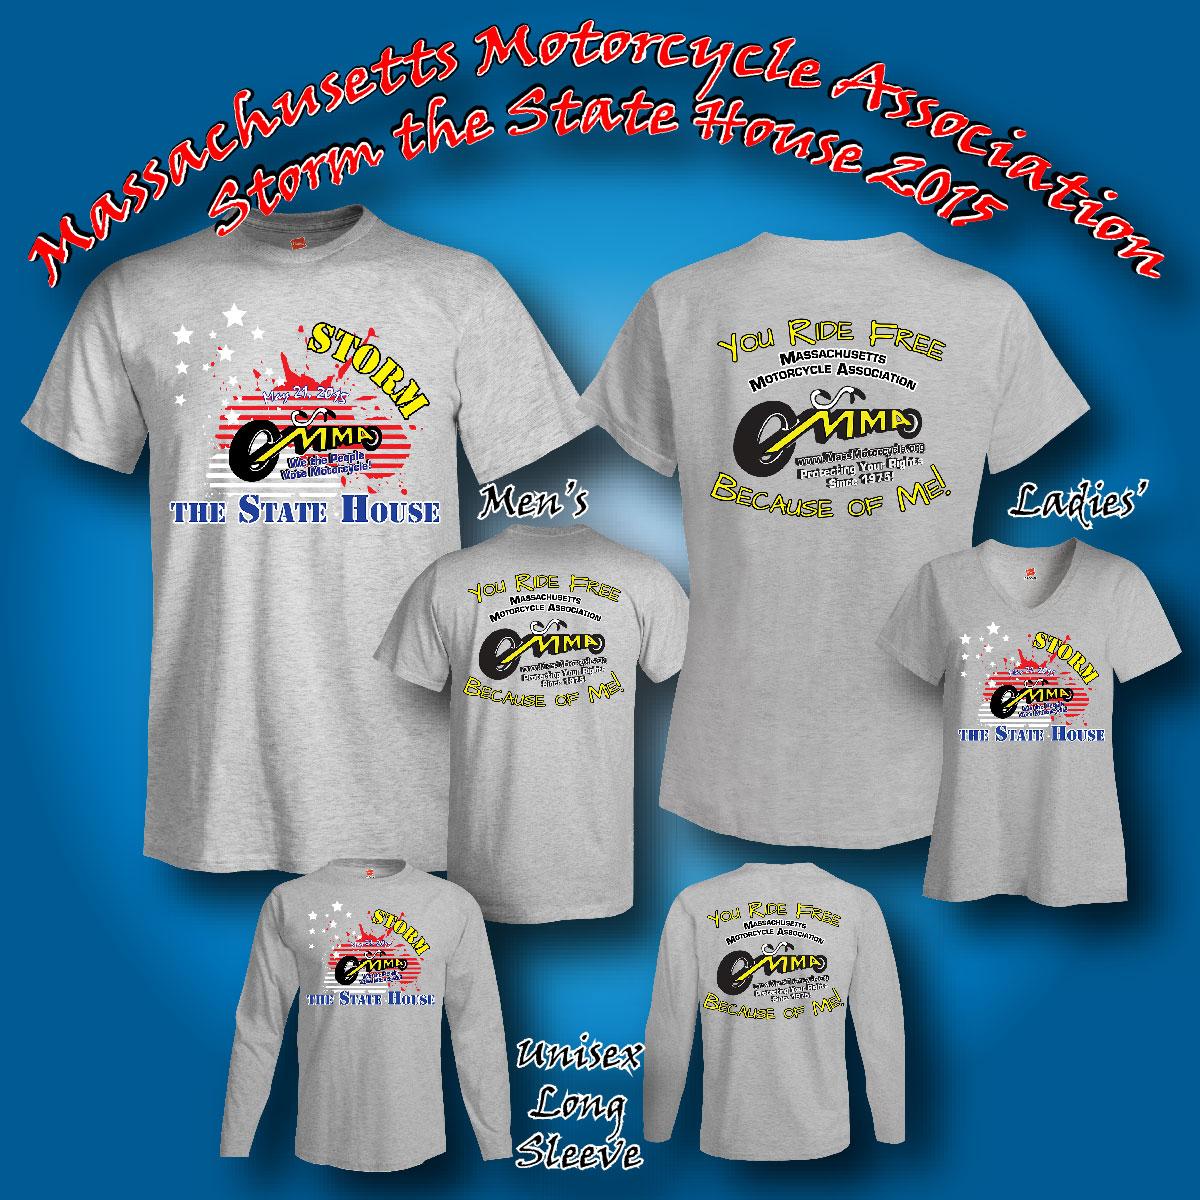 2015 Storm Shirts